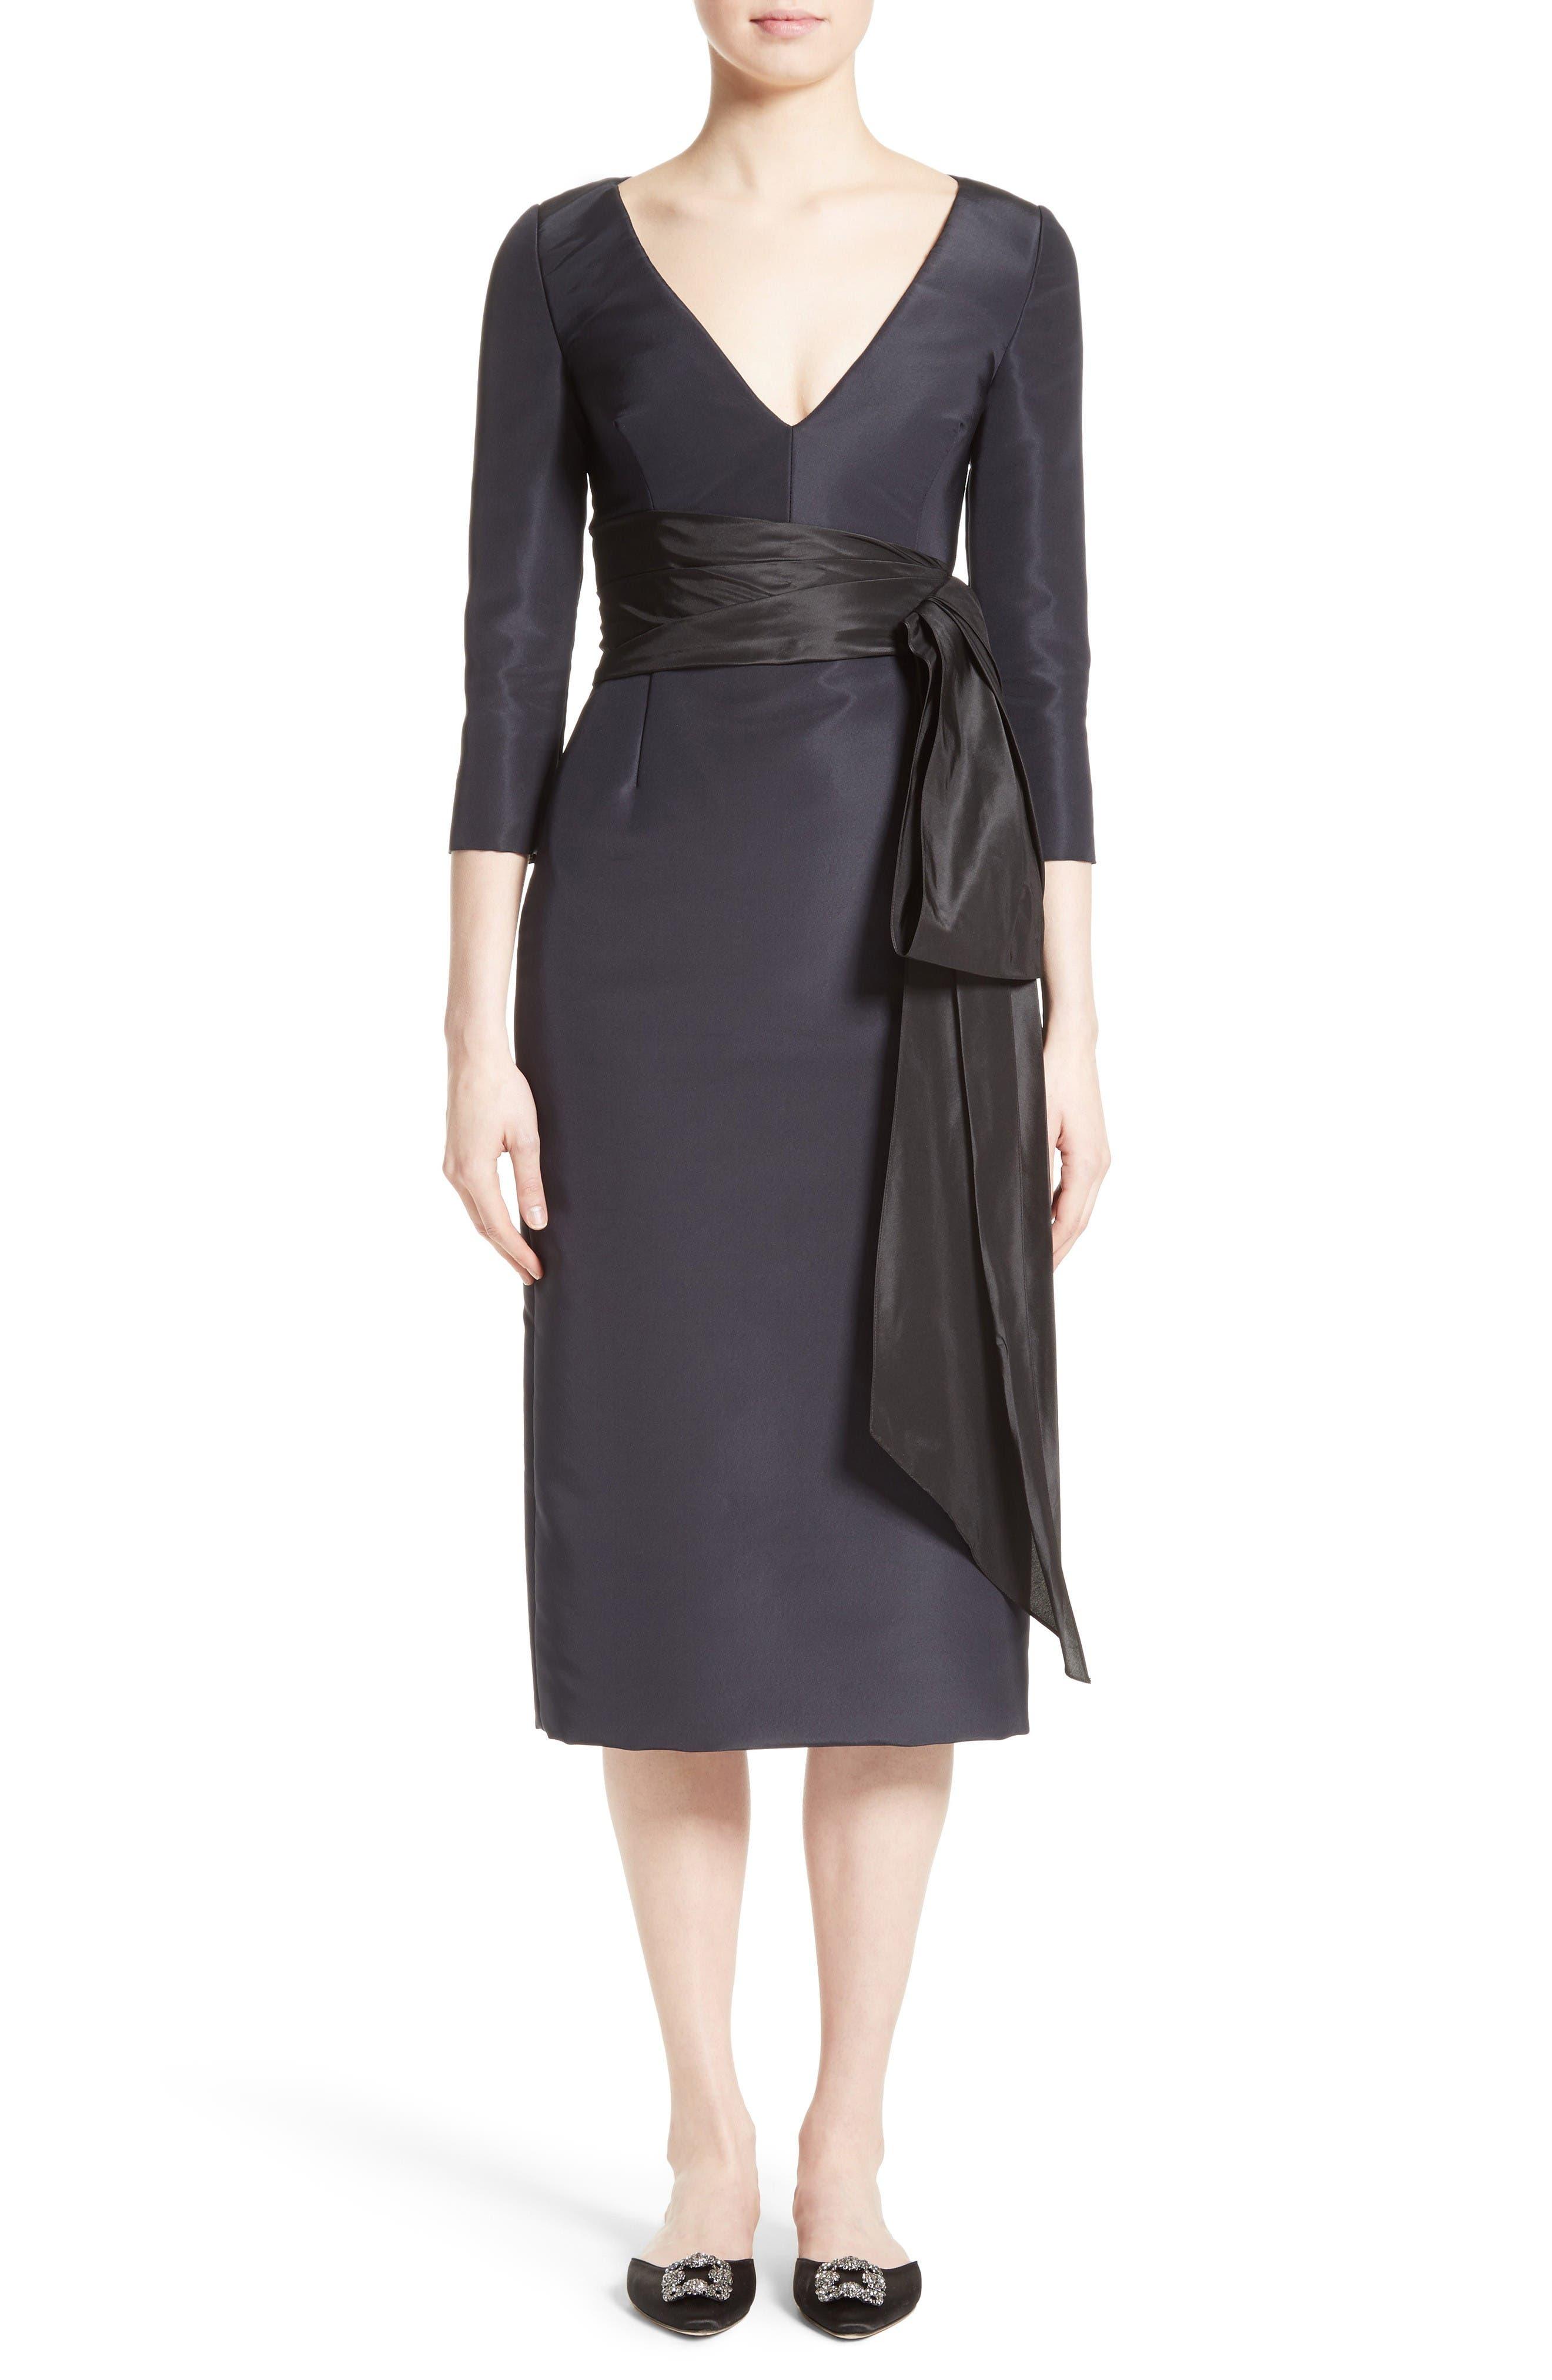 Alternate Image 1 Selected - Oscar de la Renta Silk Moiré Cocktail Dress